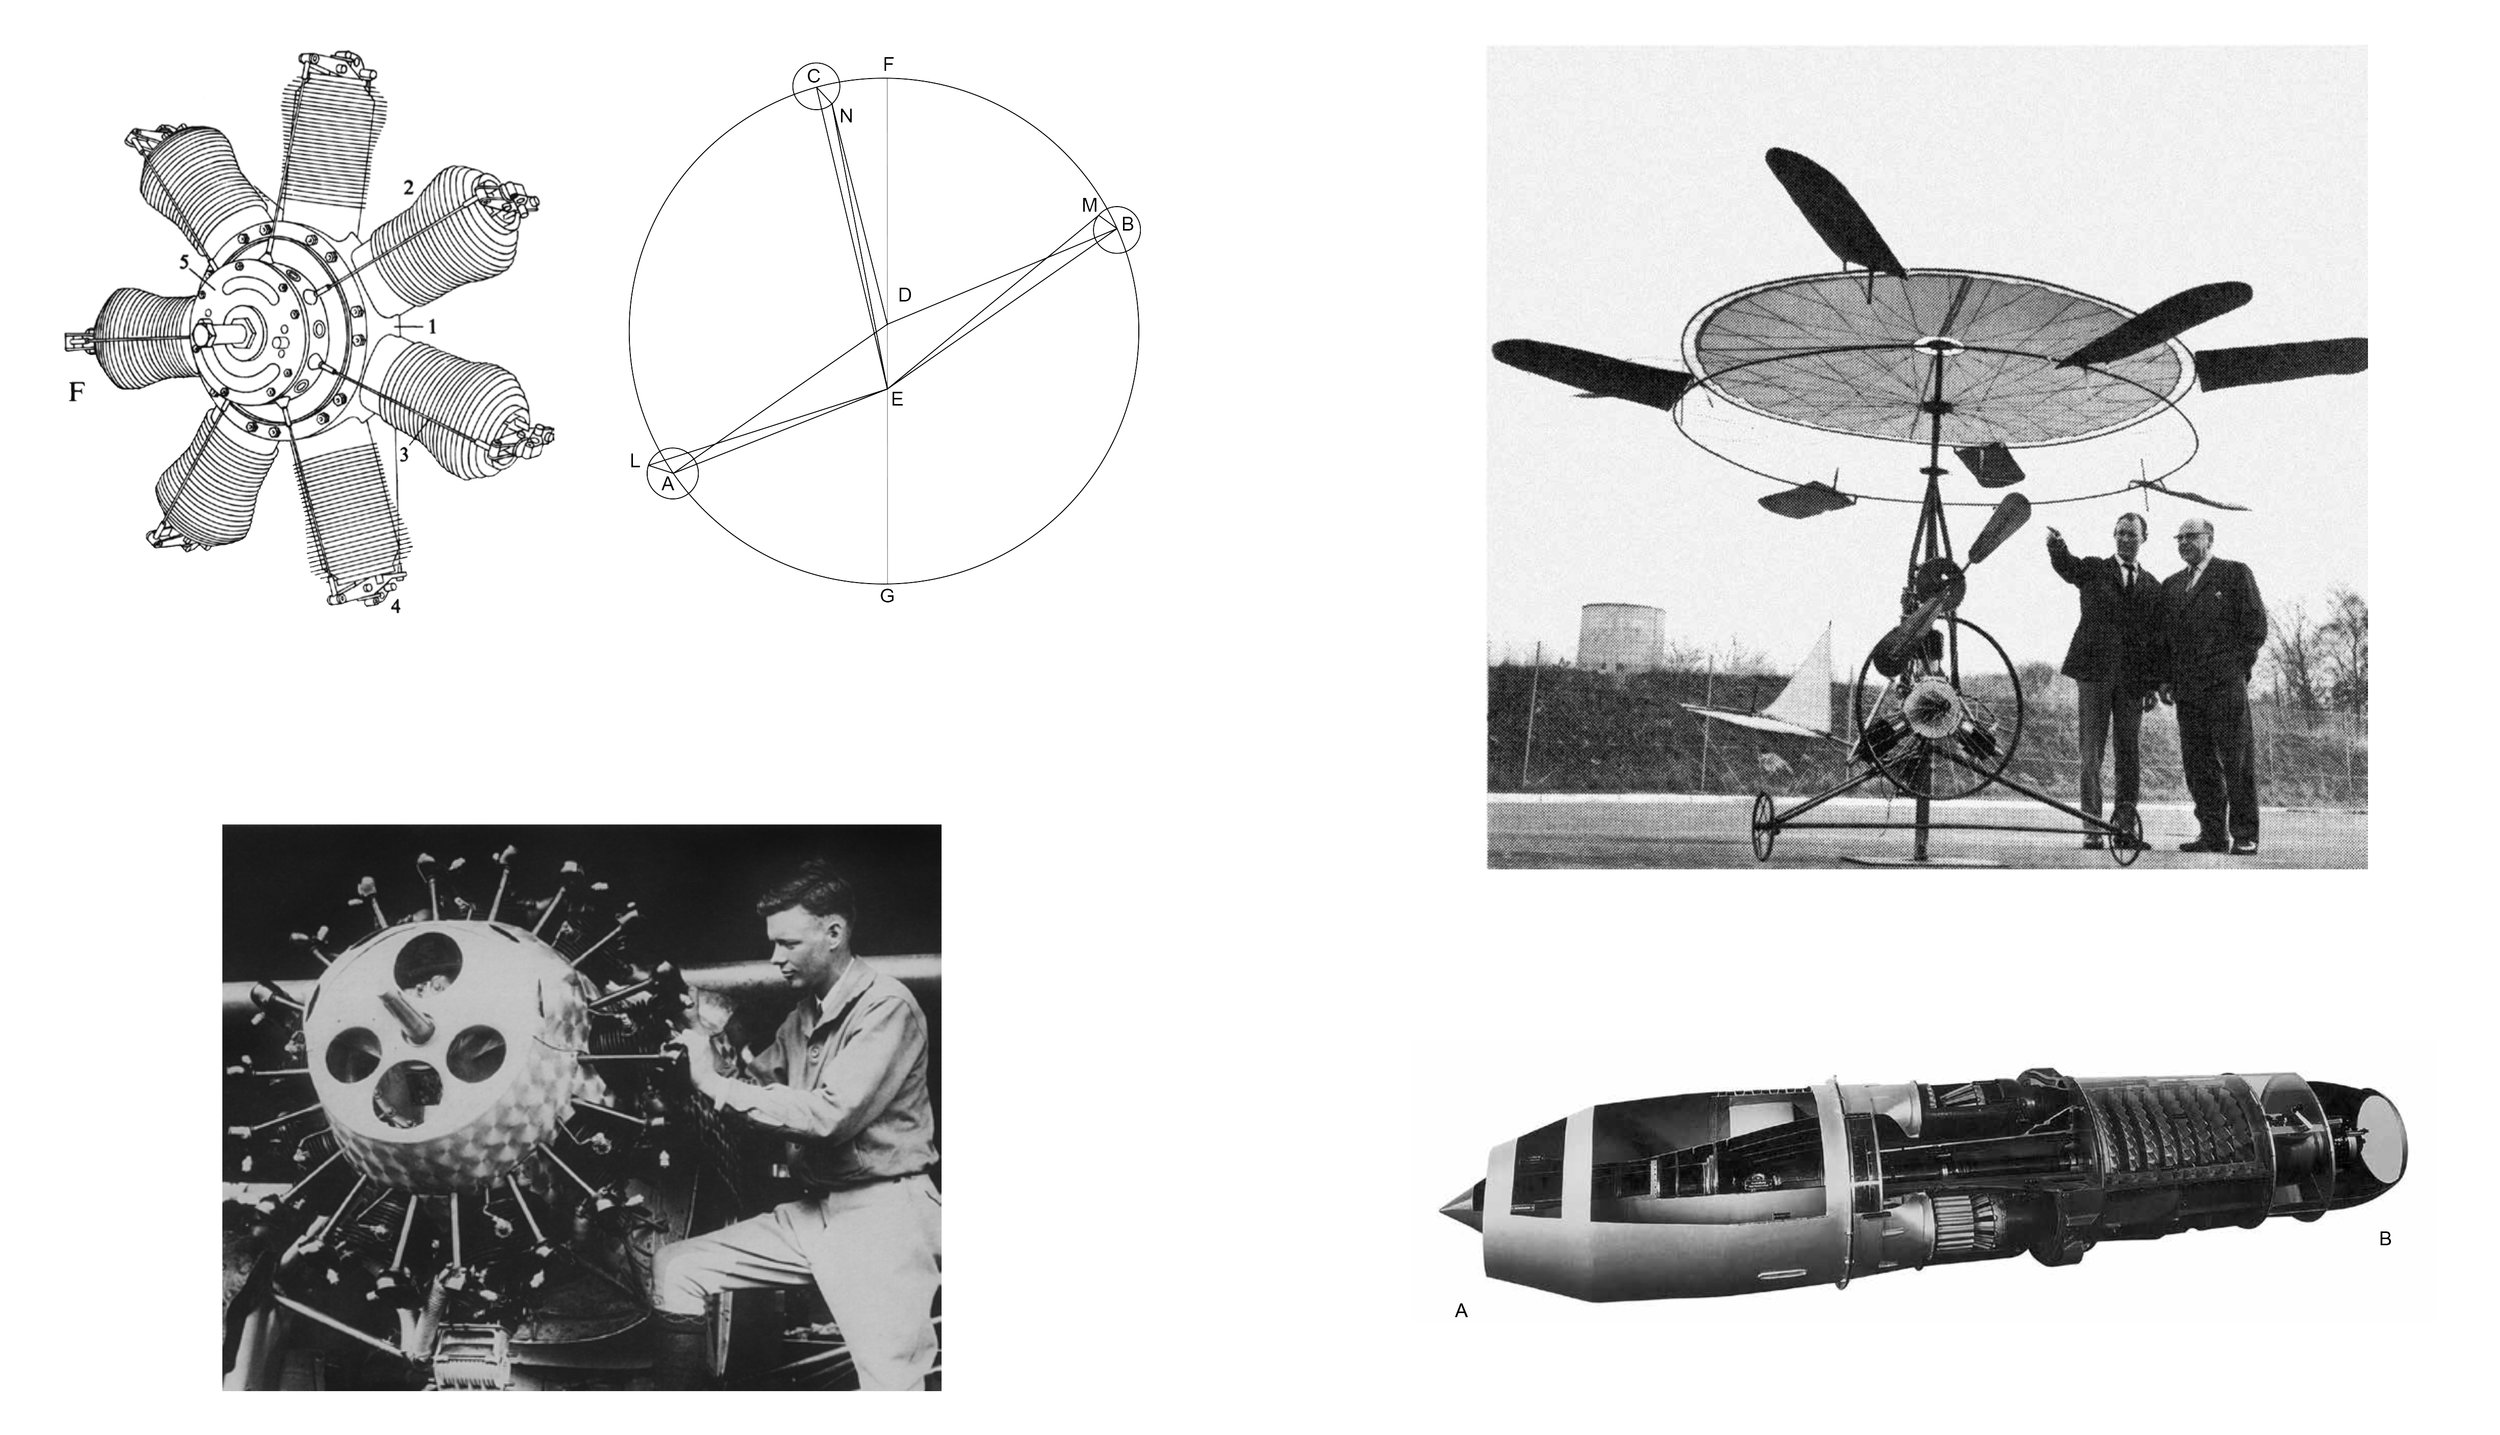 Andrea Galvani © Study on Aerodynamic Evolution_2014-2015.jpg